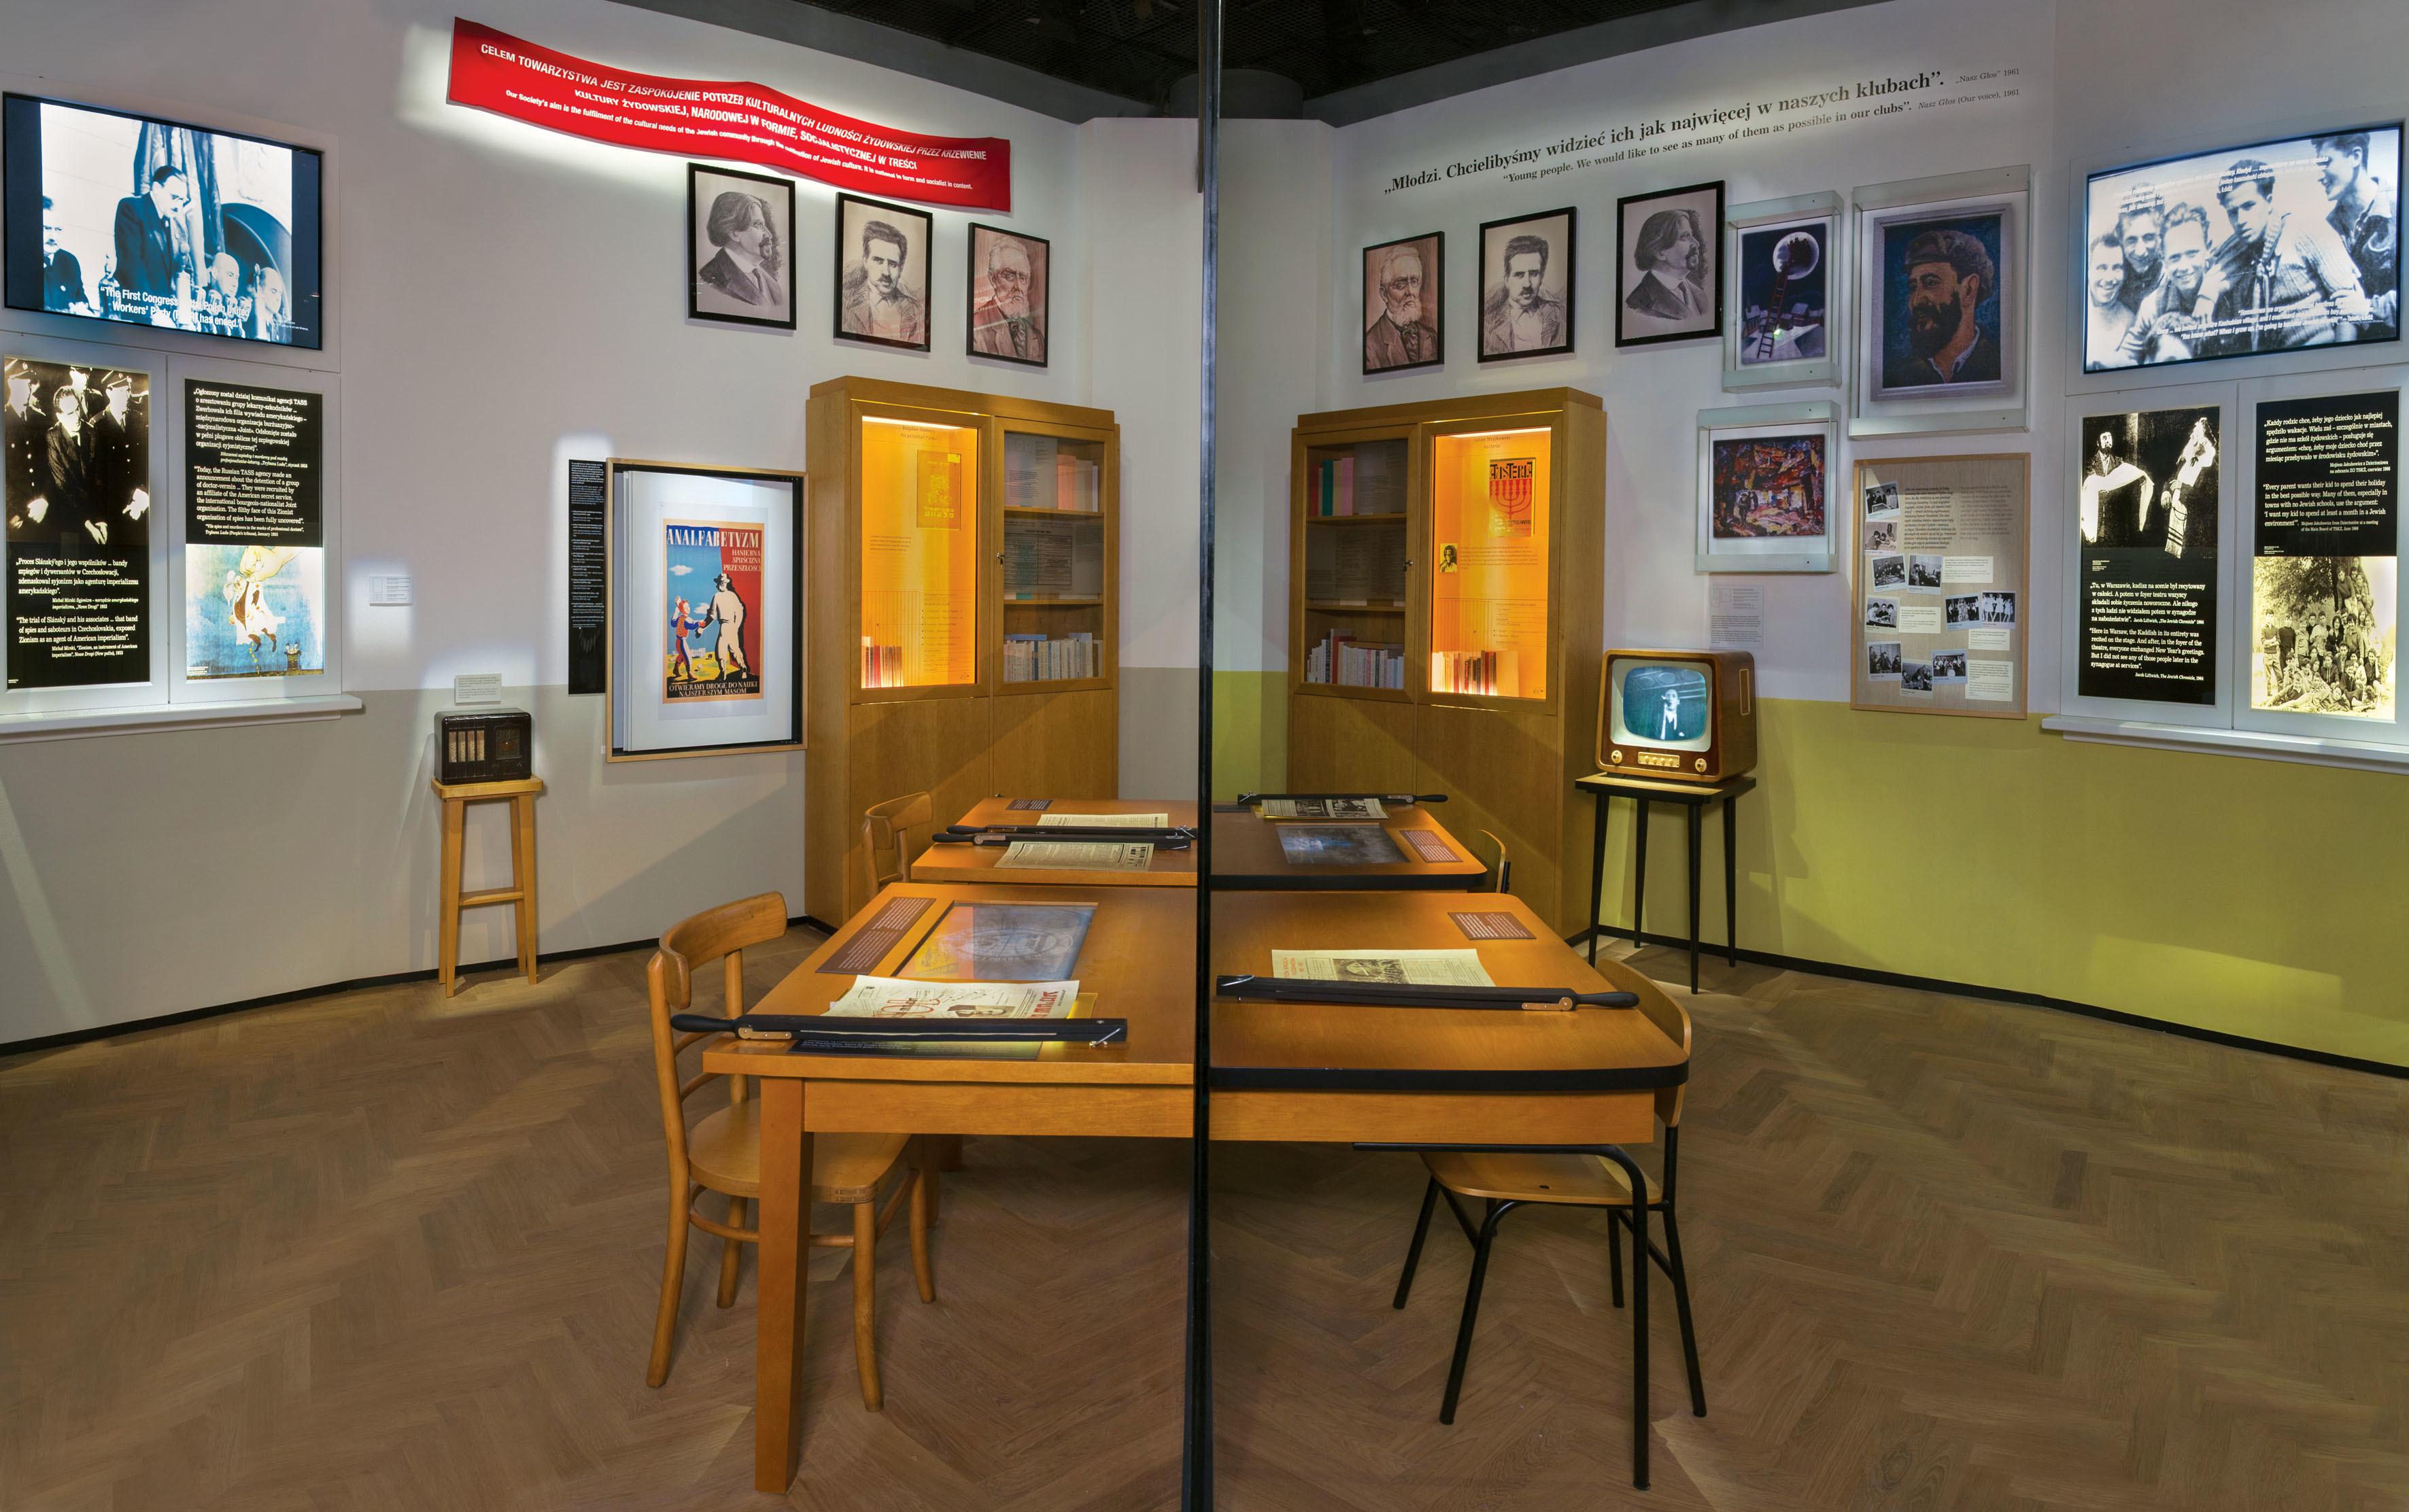 "<p>Postwar Years Gallery. M. Starowieyska D. Golik / <span class=""caps"">POLIN</span> Museum of the History of Polish&nbsp;Jews</p>"